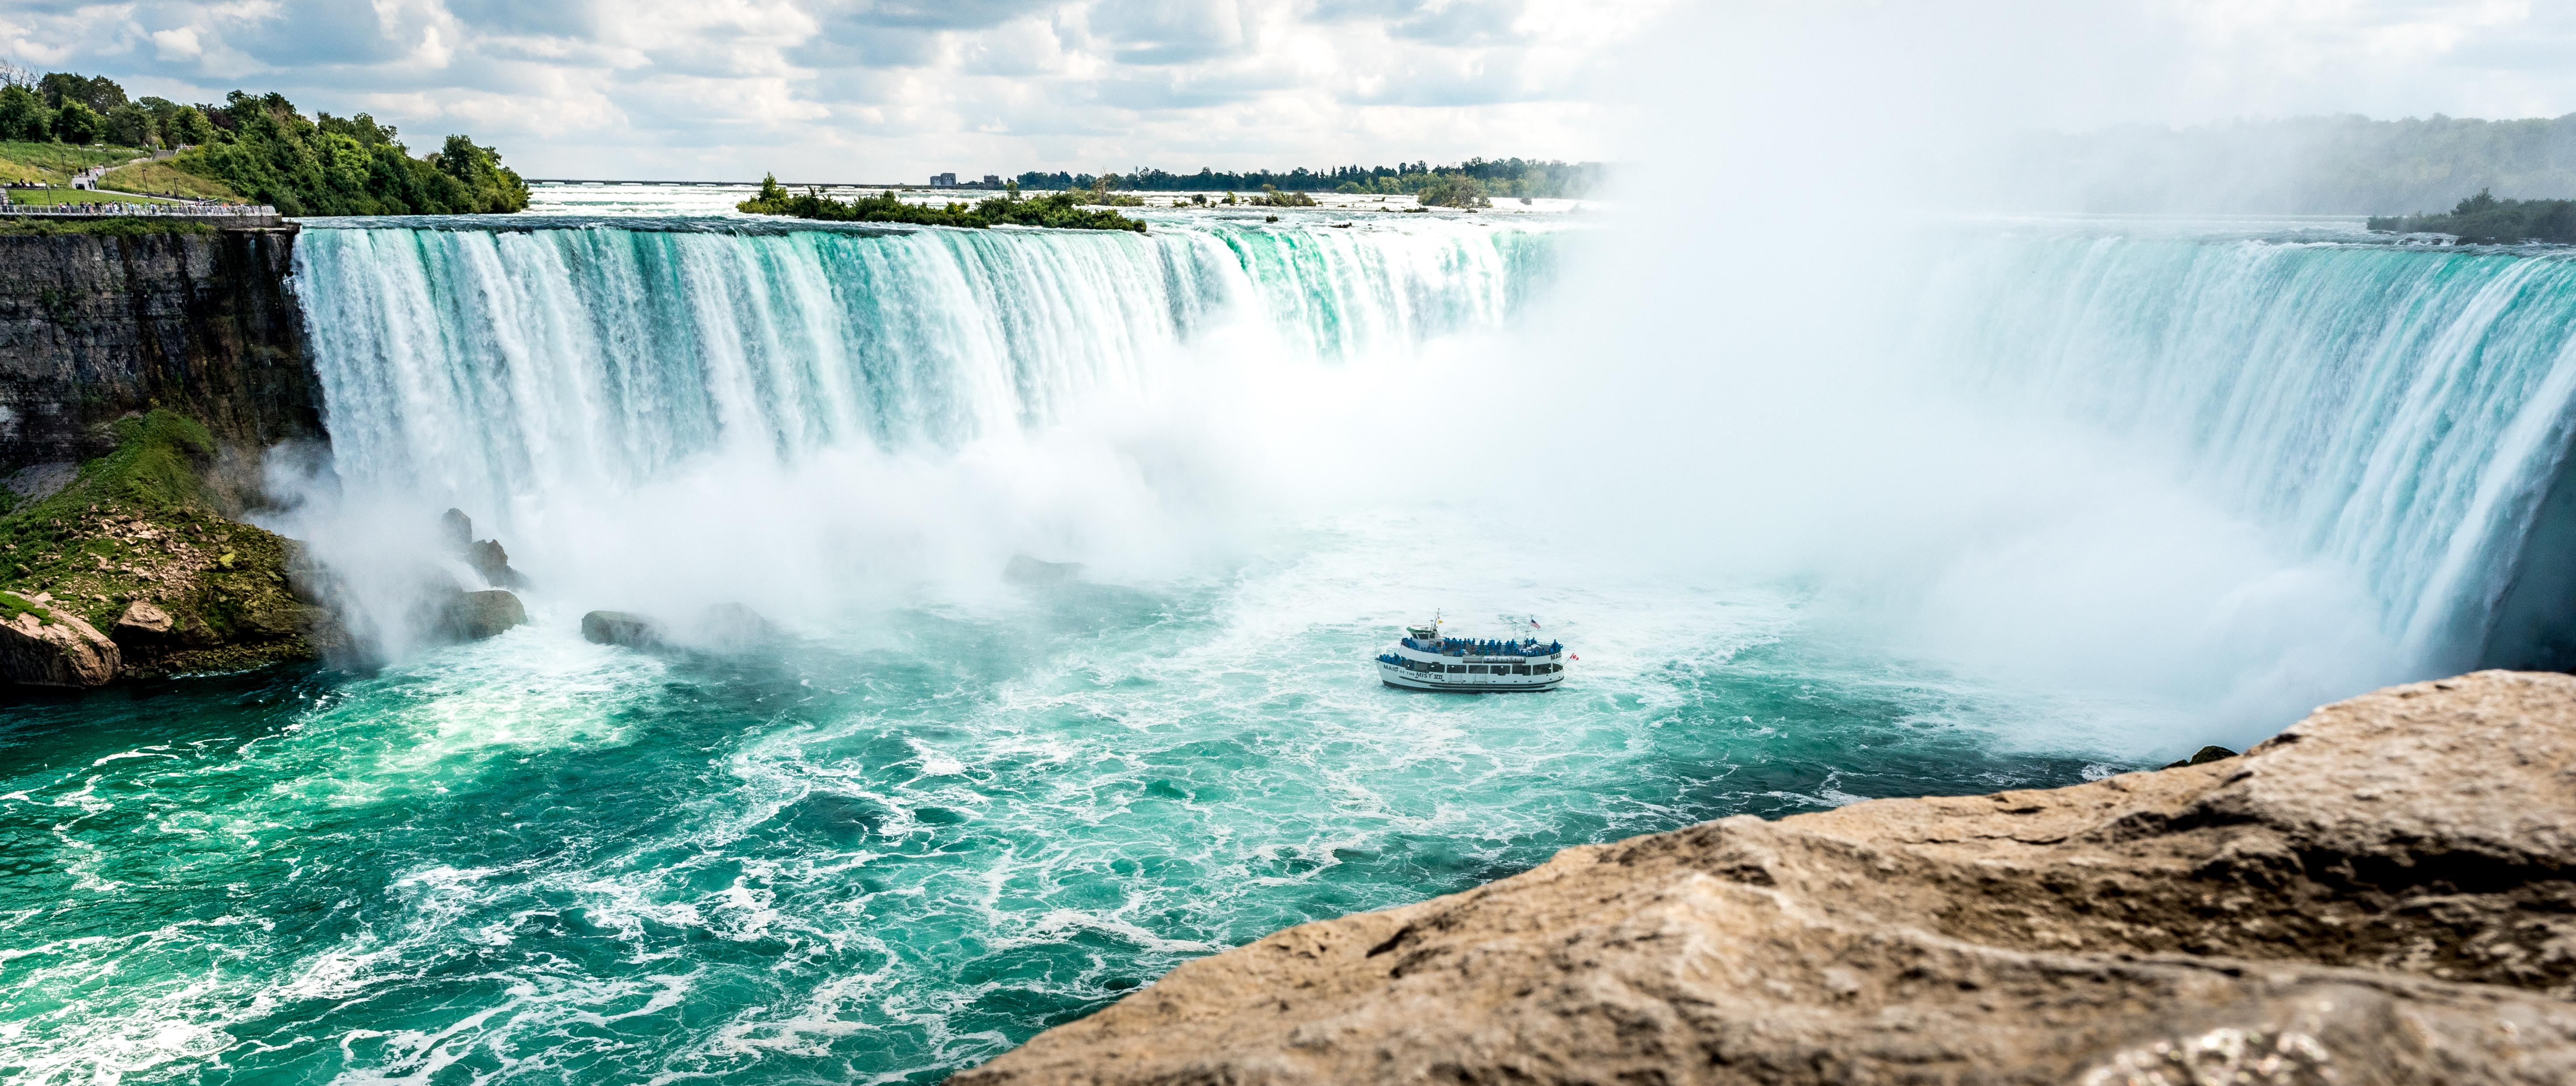 Free Images Landscape Nature Niagara Falls Wallpaper